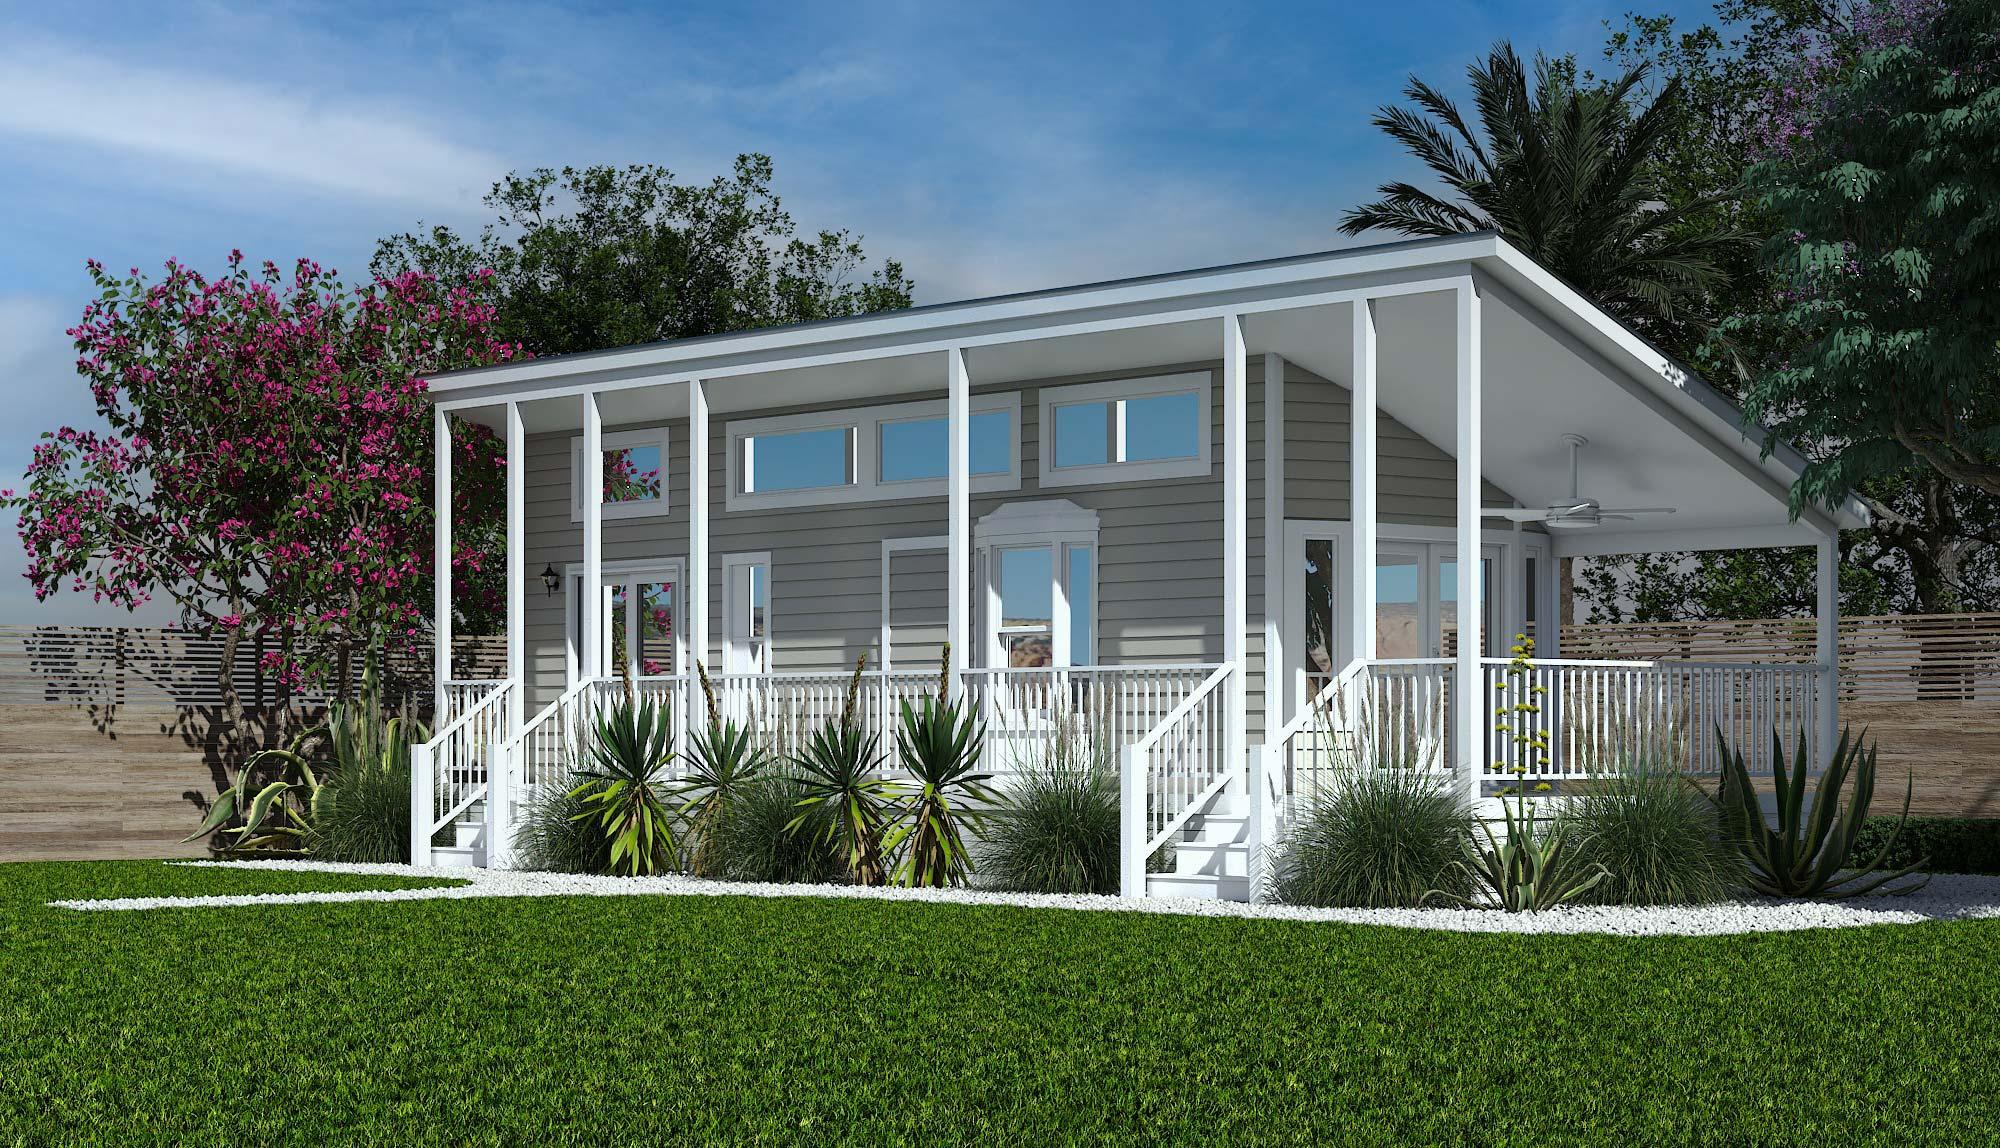 Cavco set to unveil NEW Veranda model at Home Show